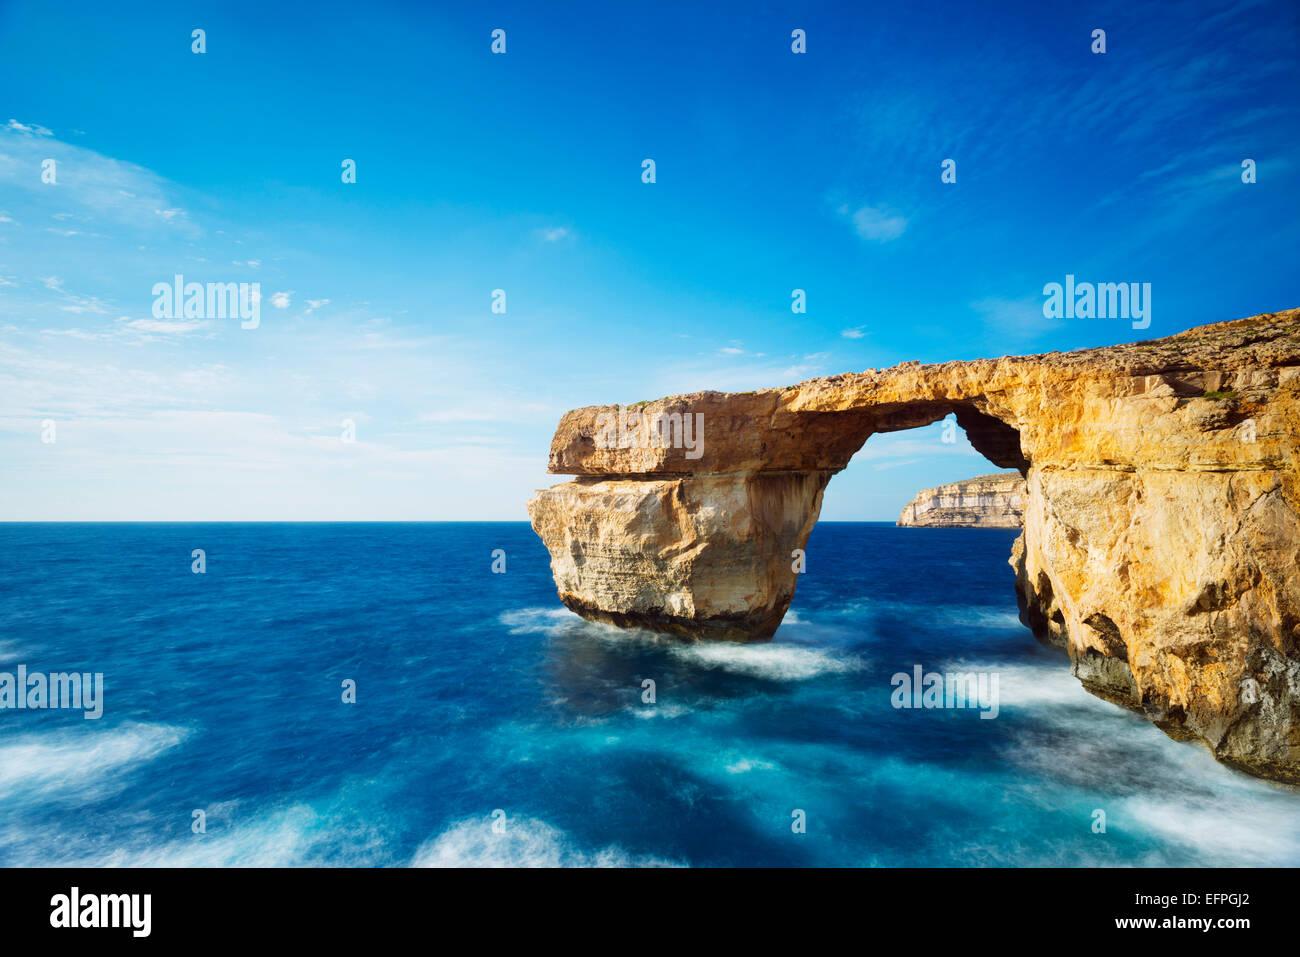 Das Azure Window naturale, Dwerja Bay, Insel Gozo, Malta, Mittelmeer, Europa Stockbild